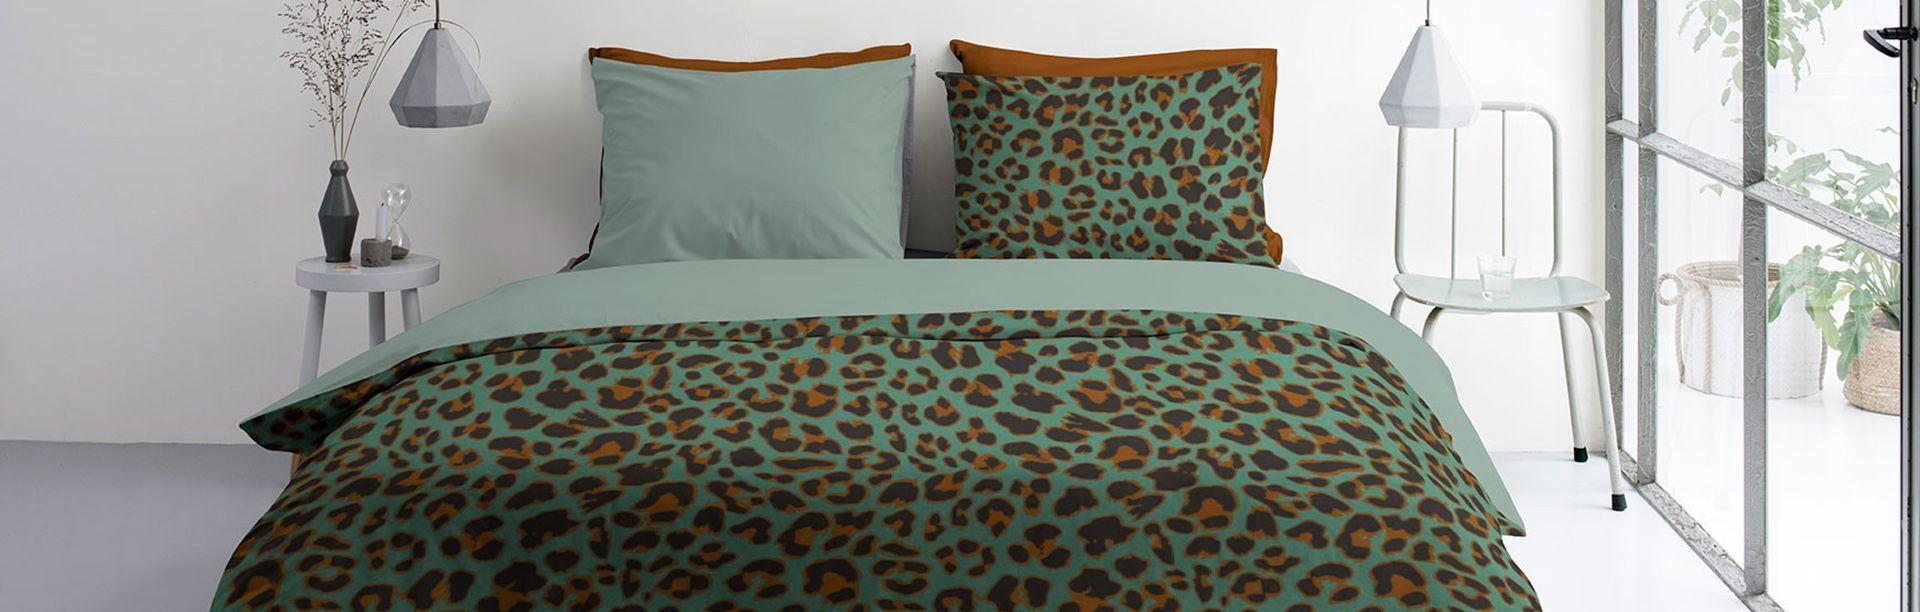 Byrklund Lazy Leopard dekbedovertrek